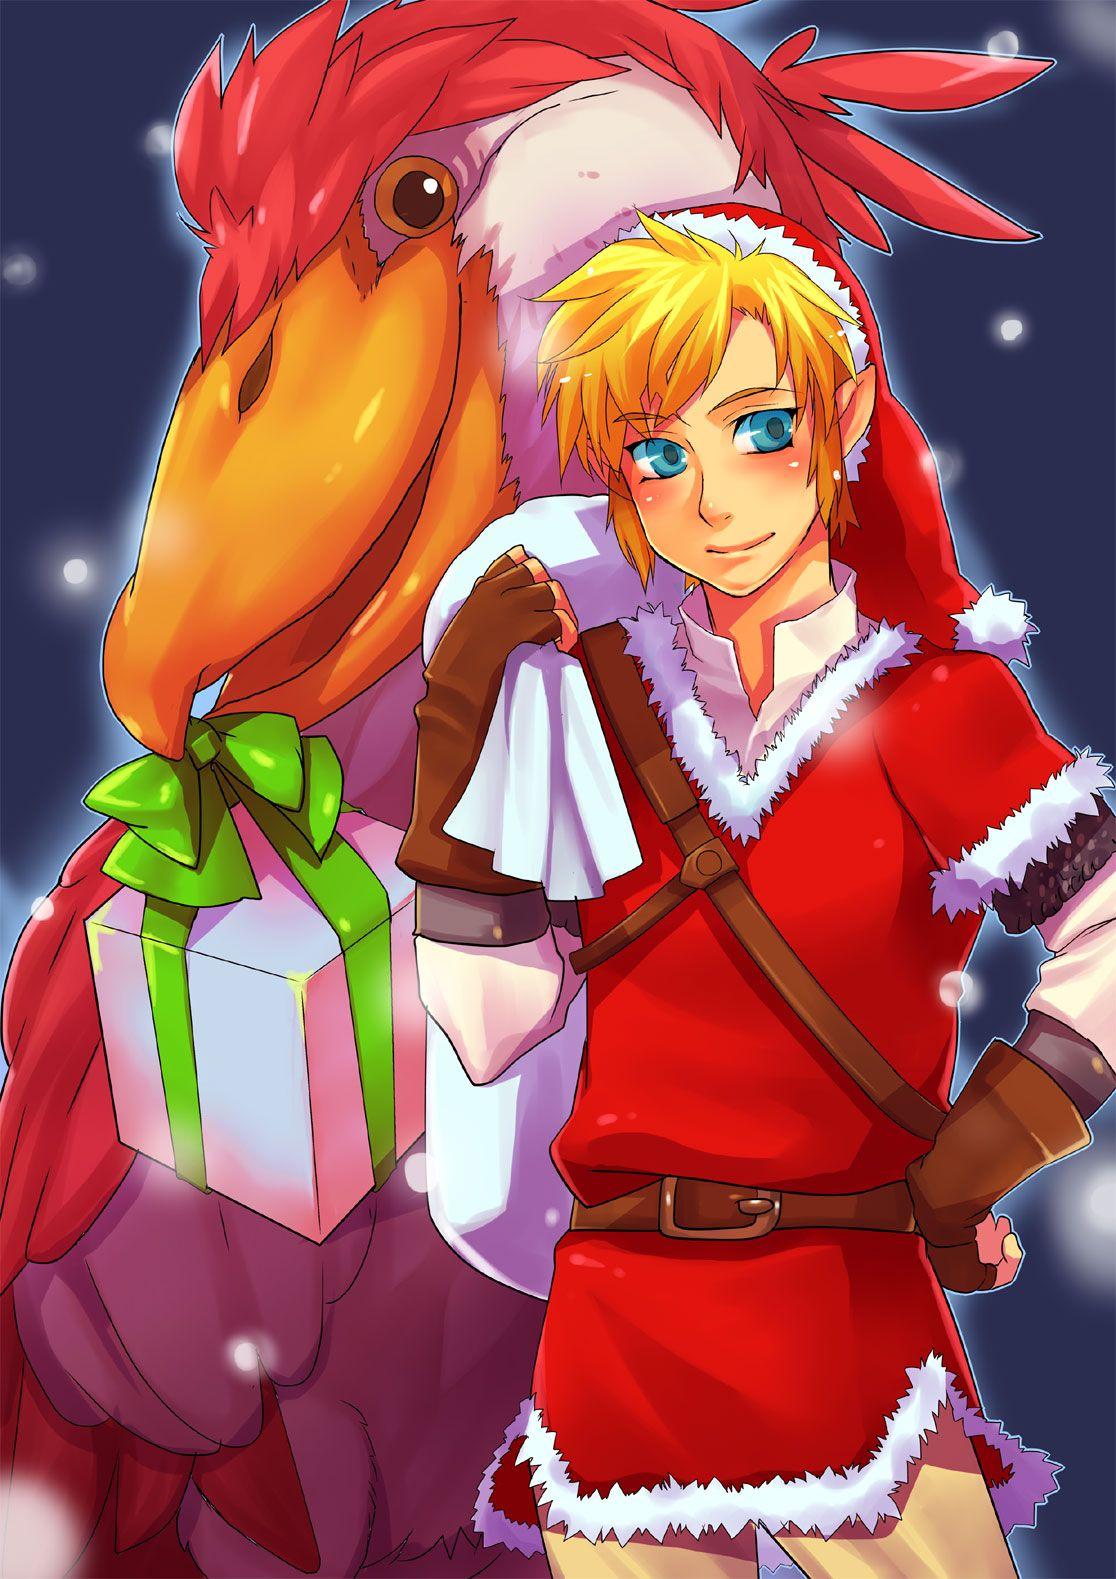 The Legend of Zelda Skyward Sword / Christmas Link / 「クリスマスの加工なしバージョン」/「no114@ついった」の漫画 [pixiv]